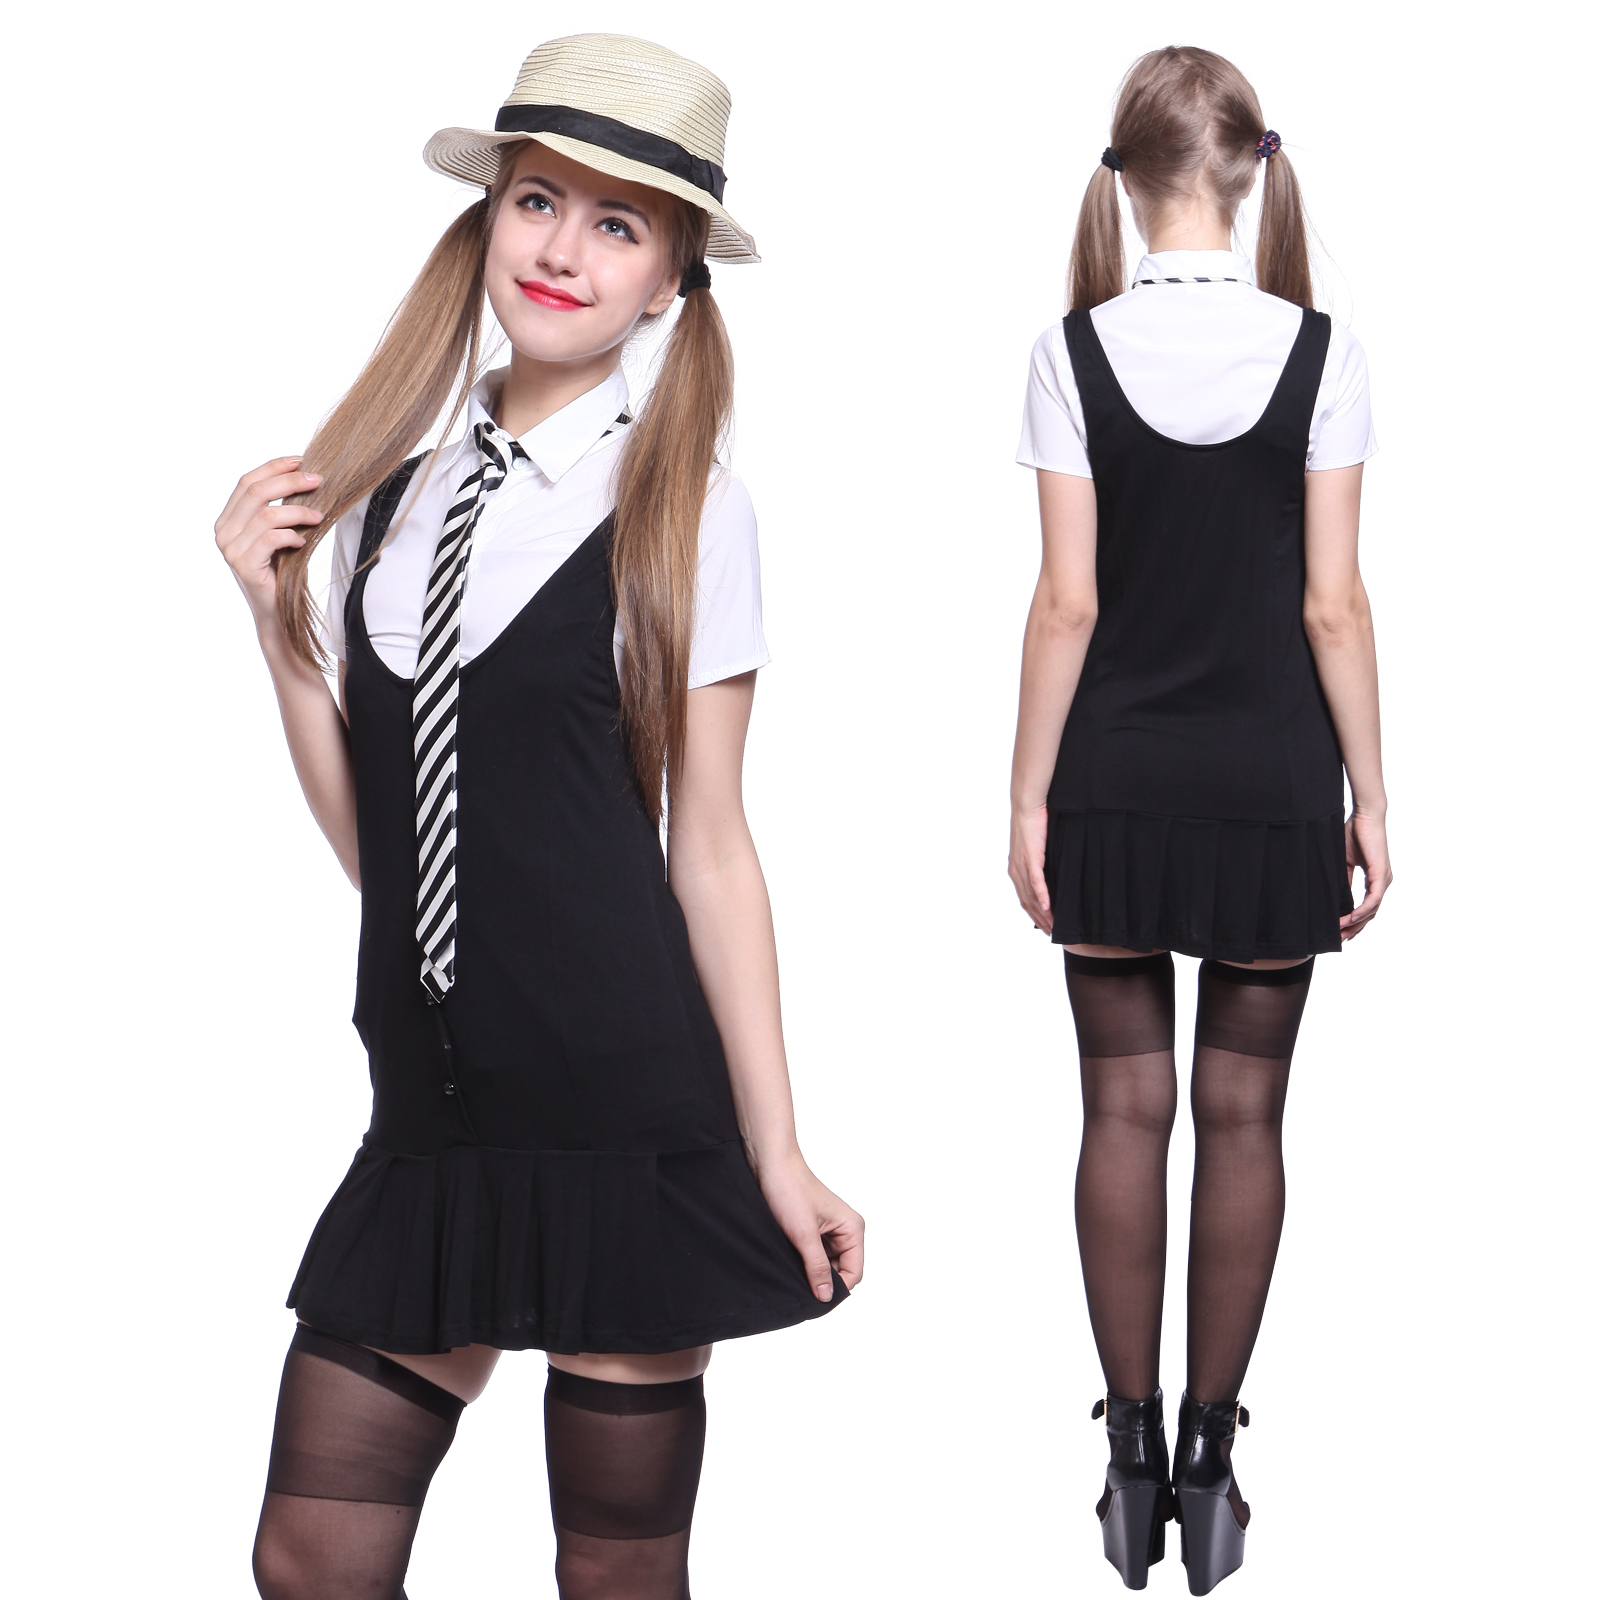 Interesting. st trinian school uniform interesting